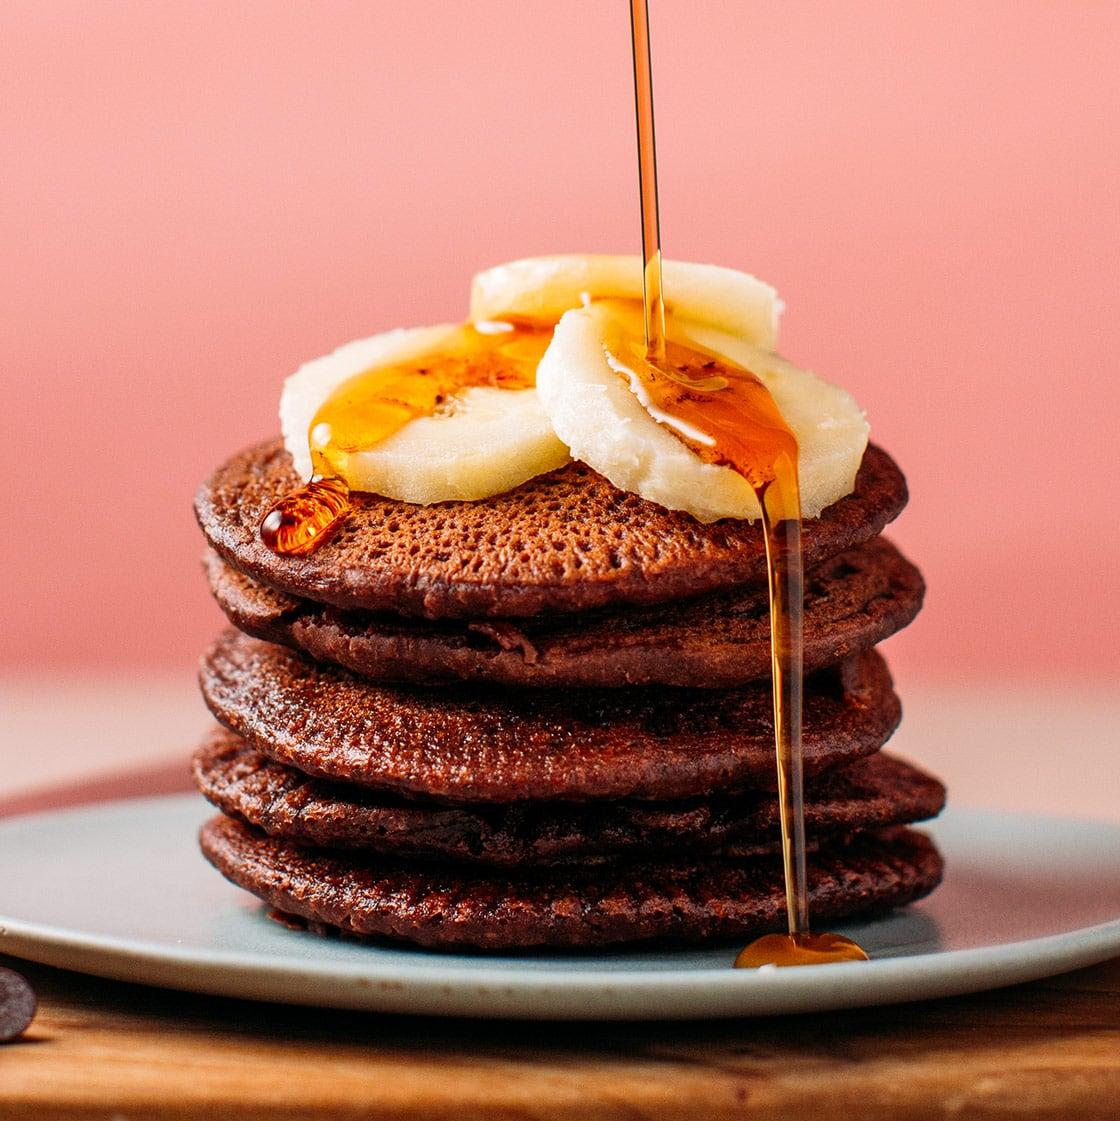 Chocolate Protein Pancakes (Vegan + GF) - Full of Plants